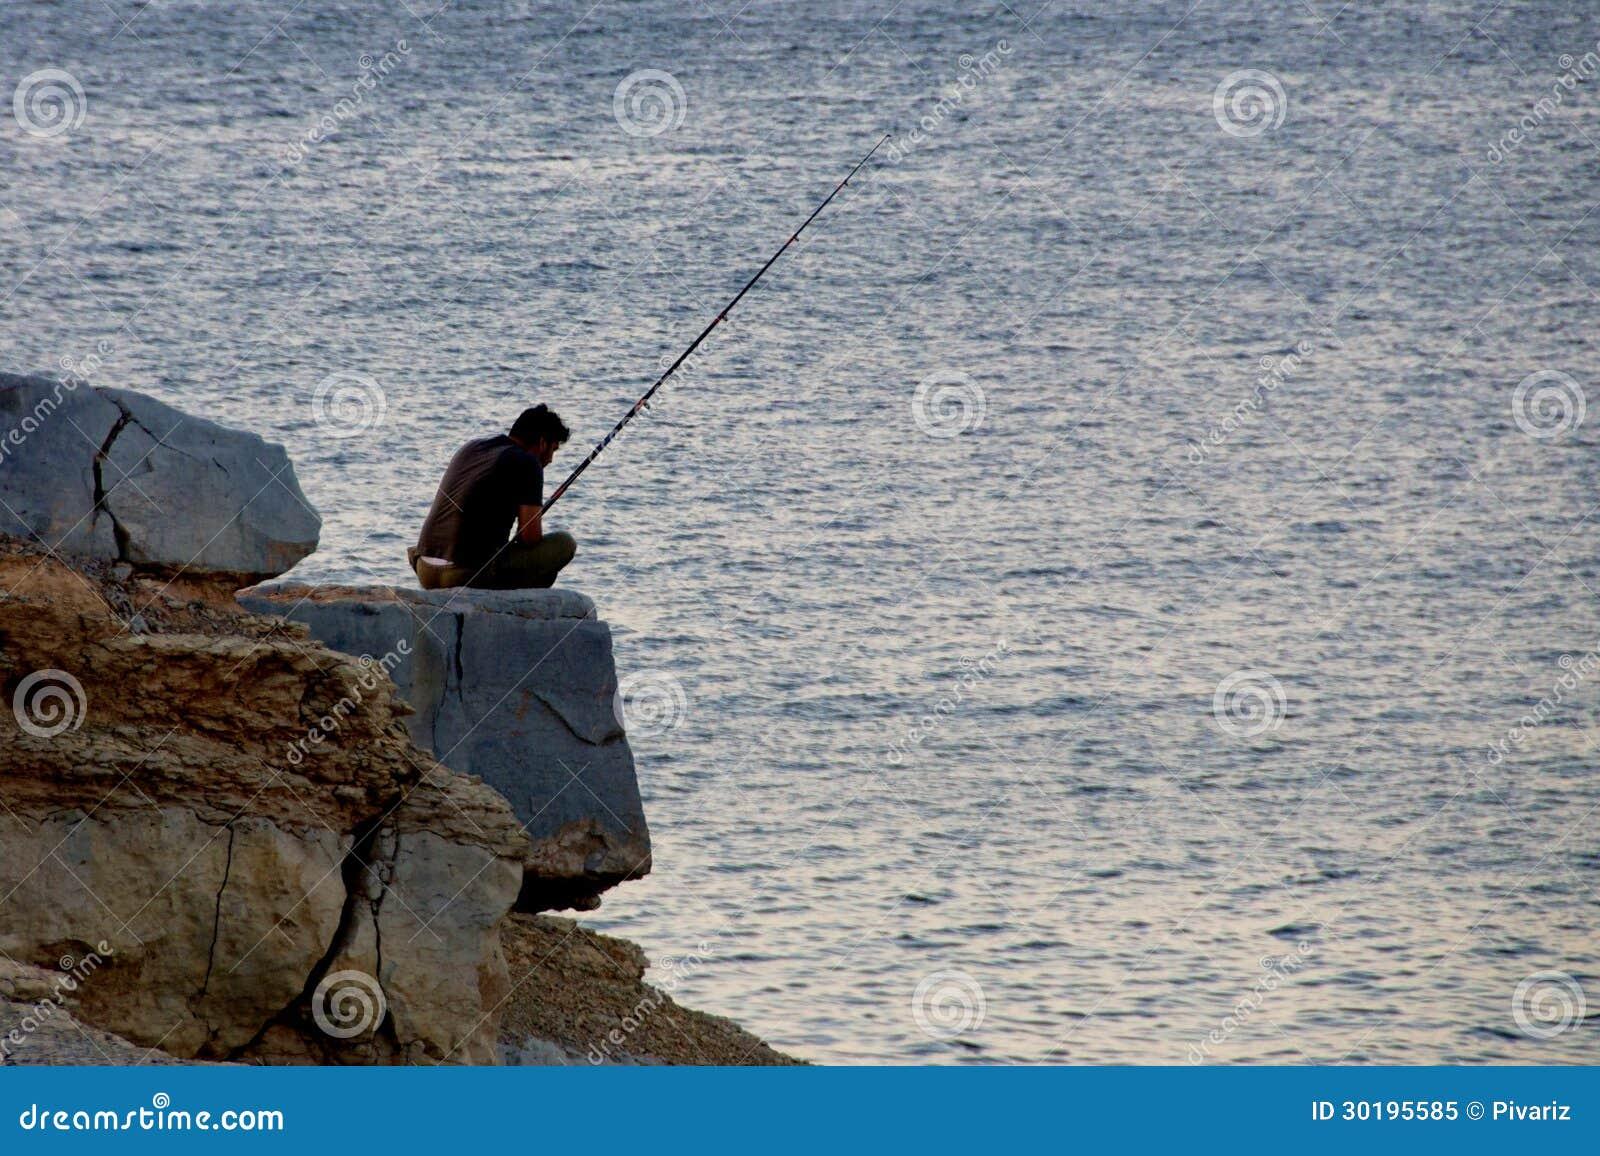 Fishing royalty free stock photo image 30195585 for Z man fishing